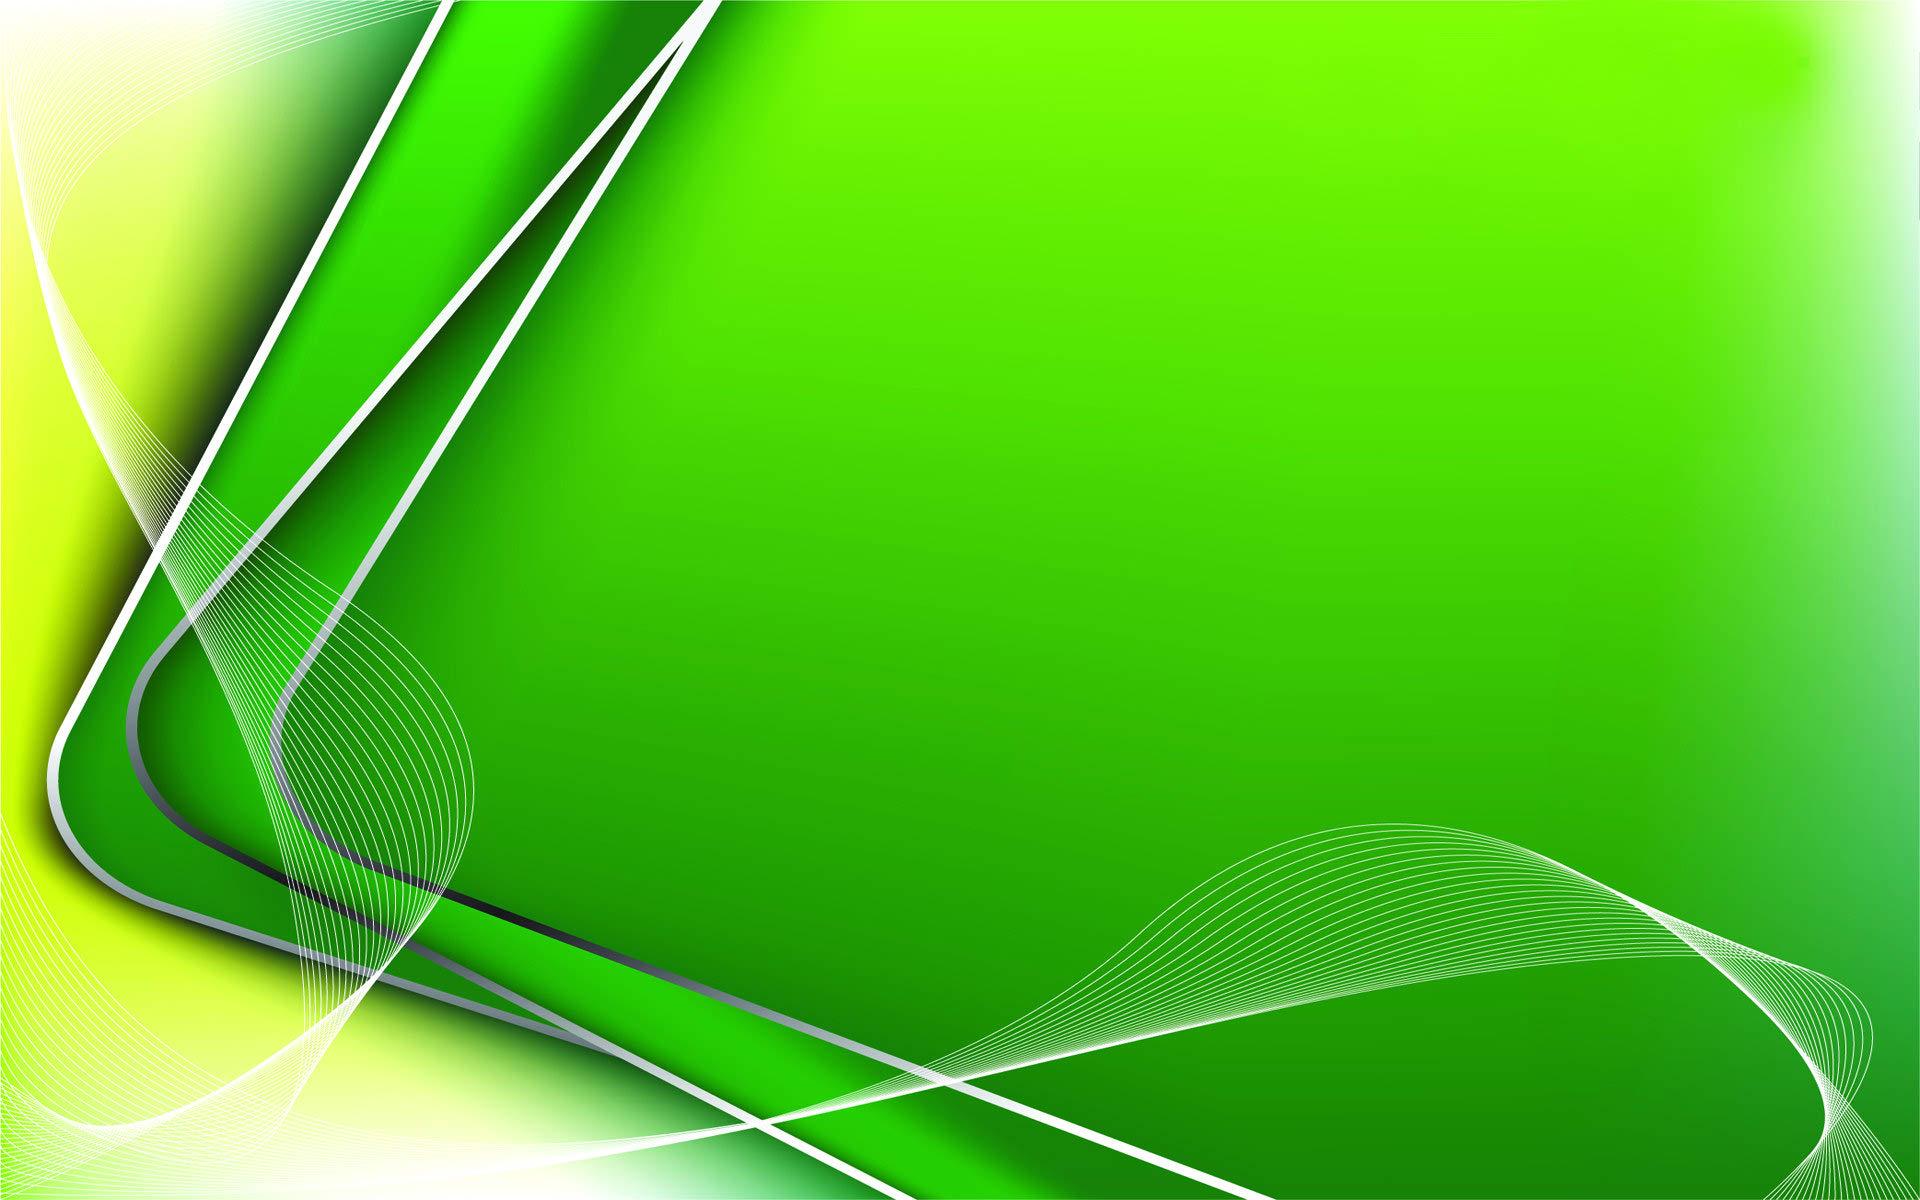 3D Green Backgrounds